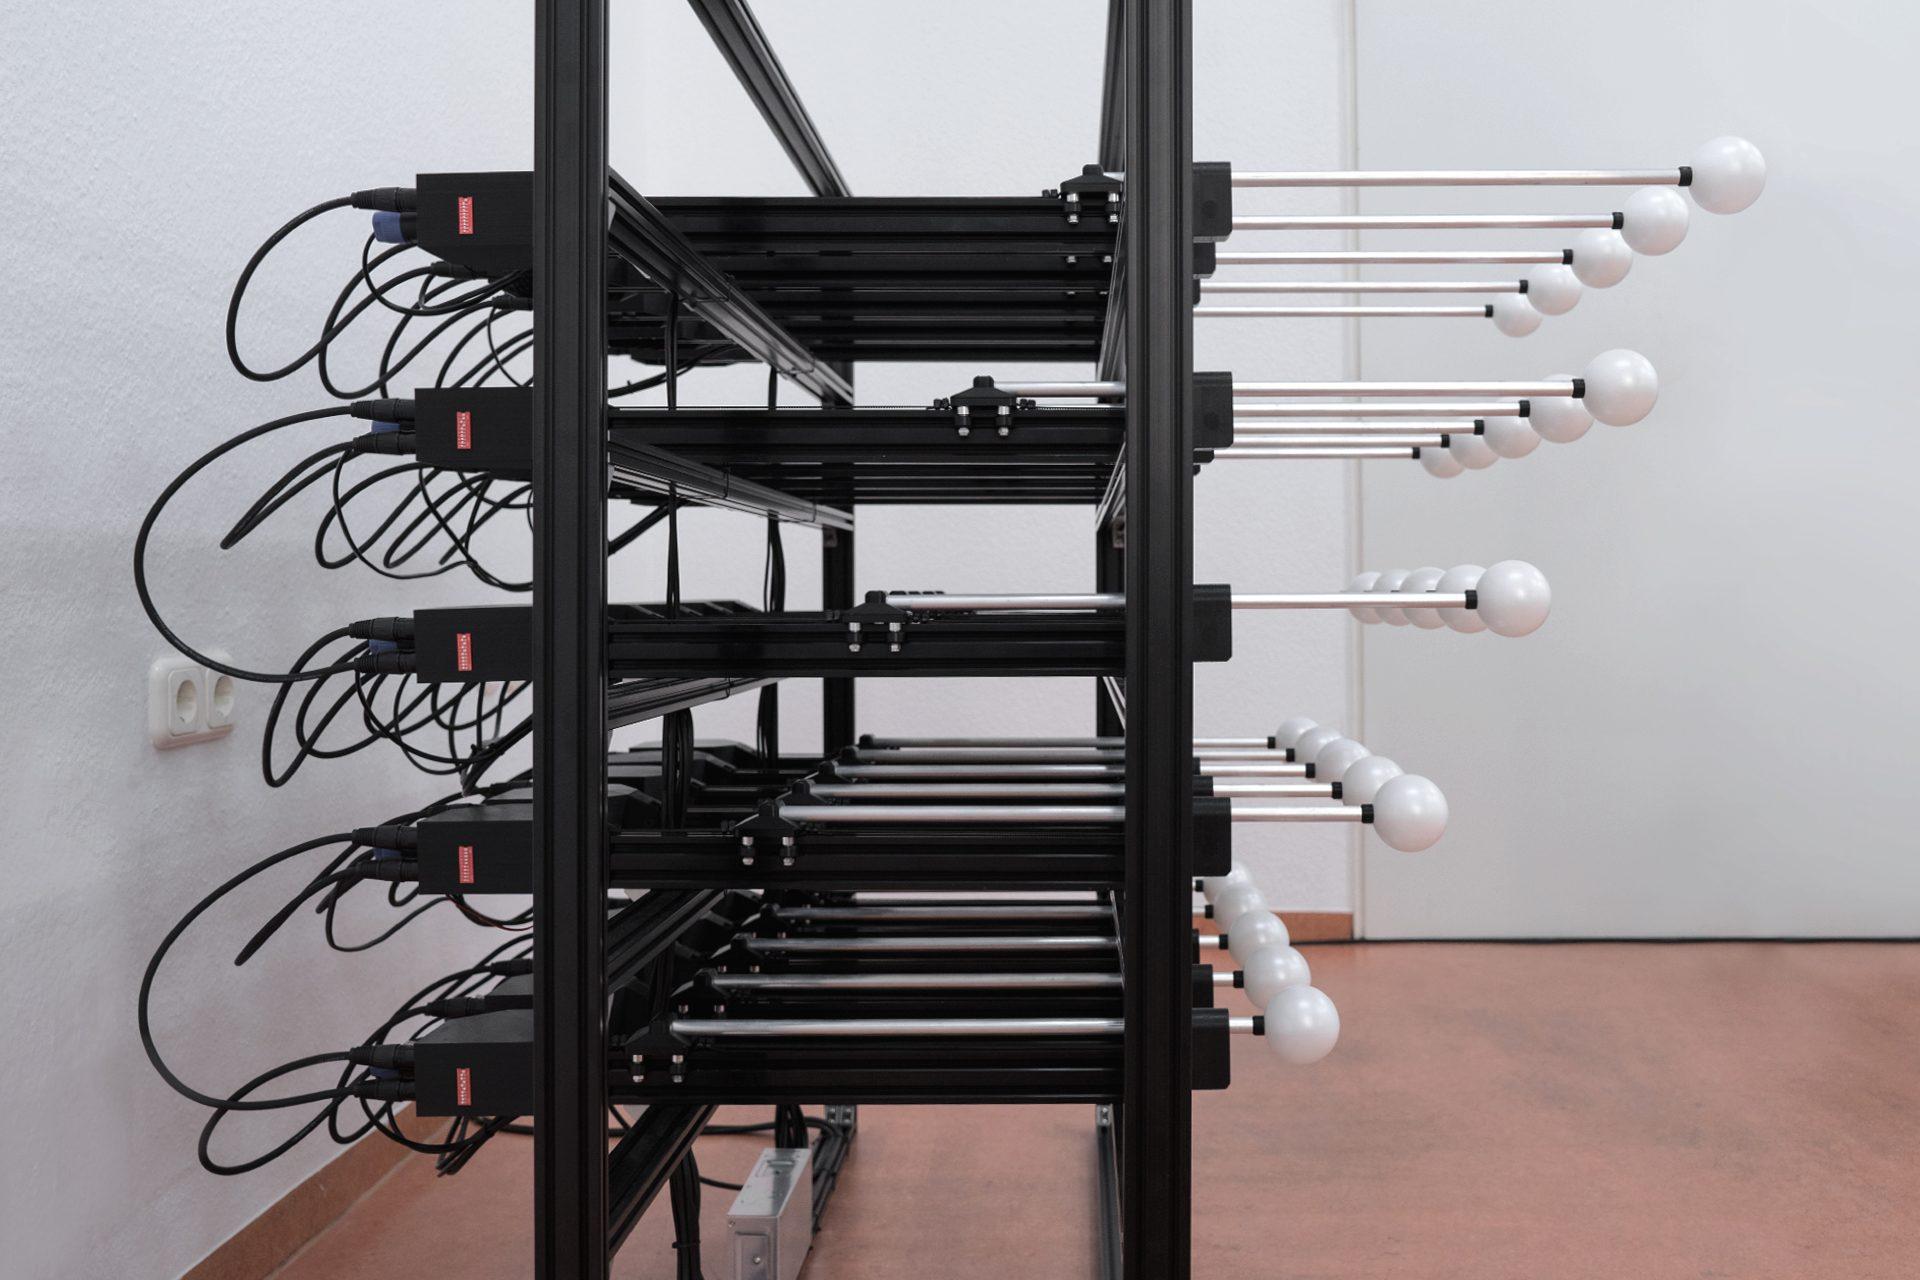 dmx-linear-actuator-slim-5